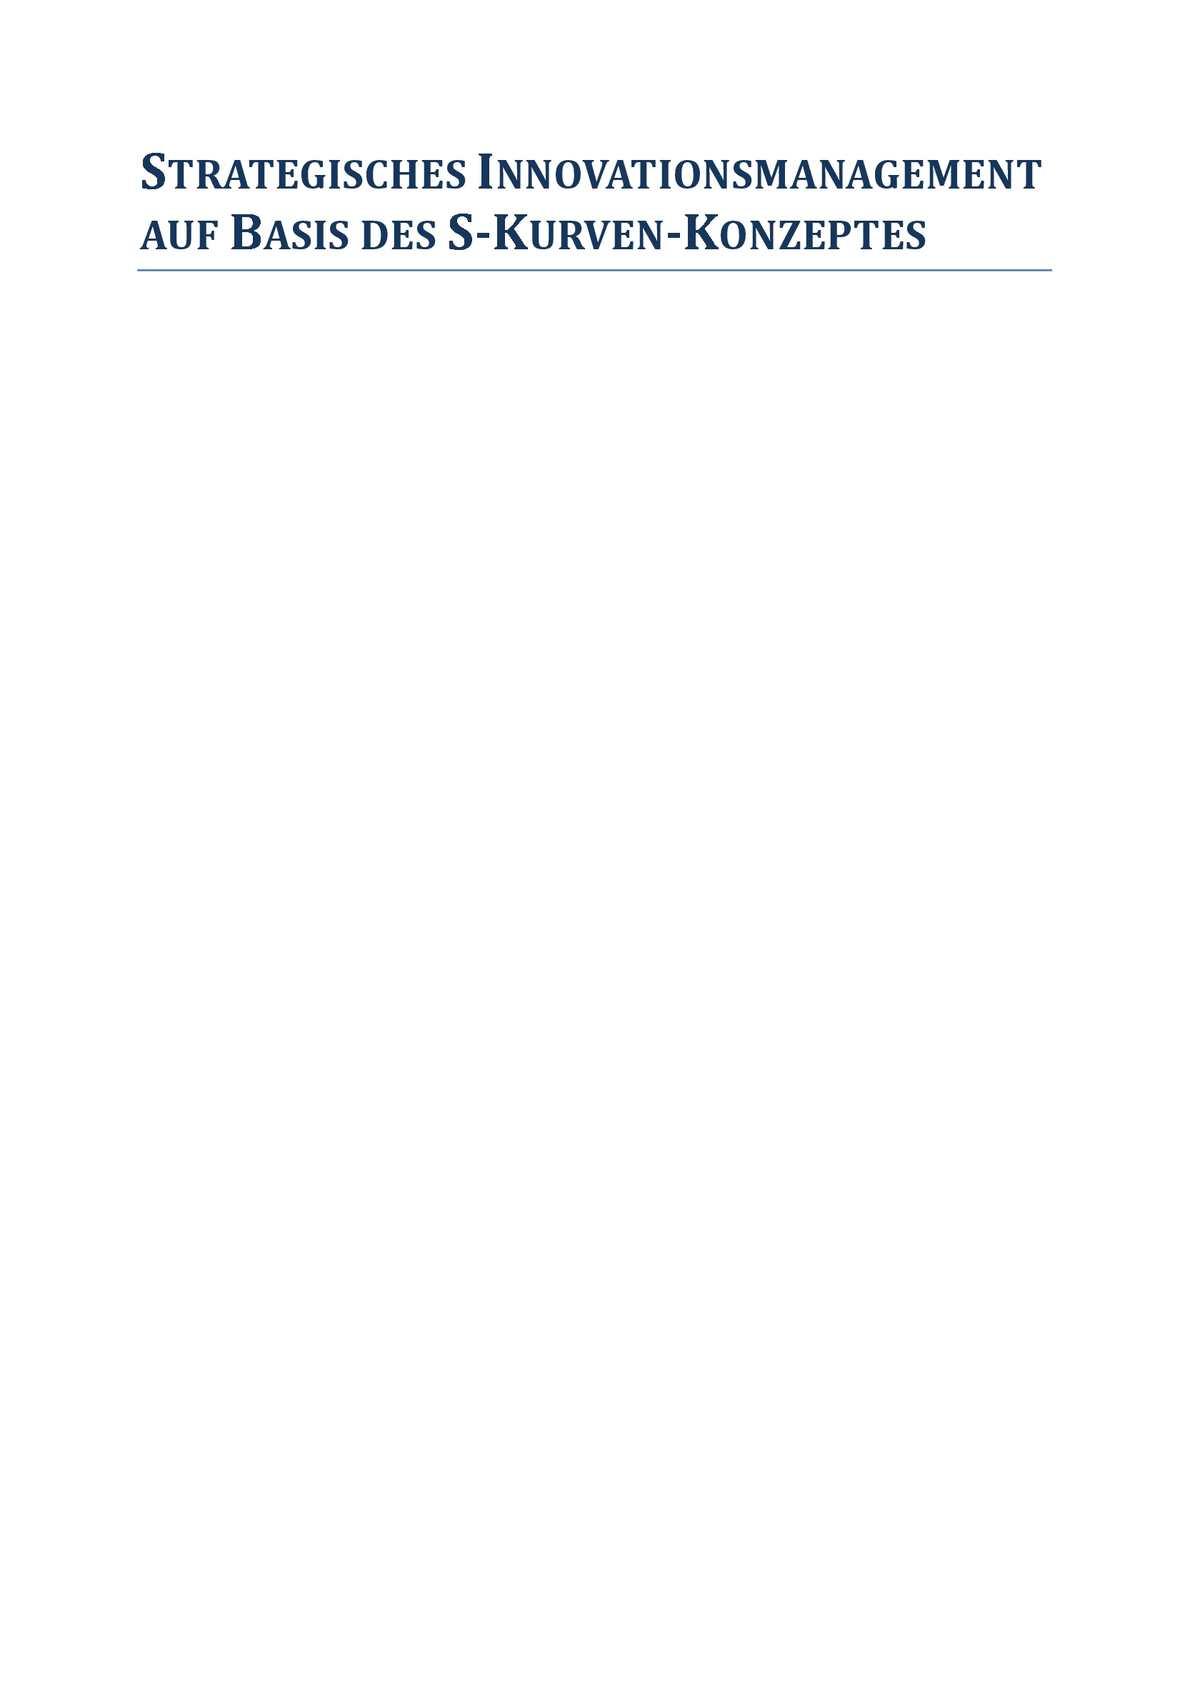 Calaméo - Strategisches Innovationsmanagement auf Basis des S-Kurven ...